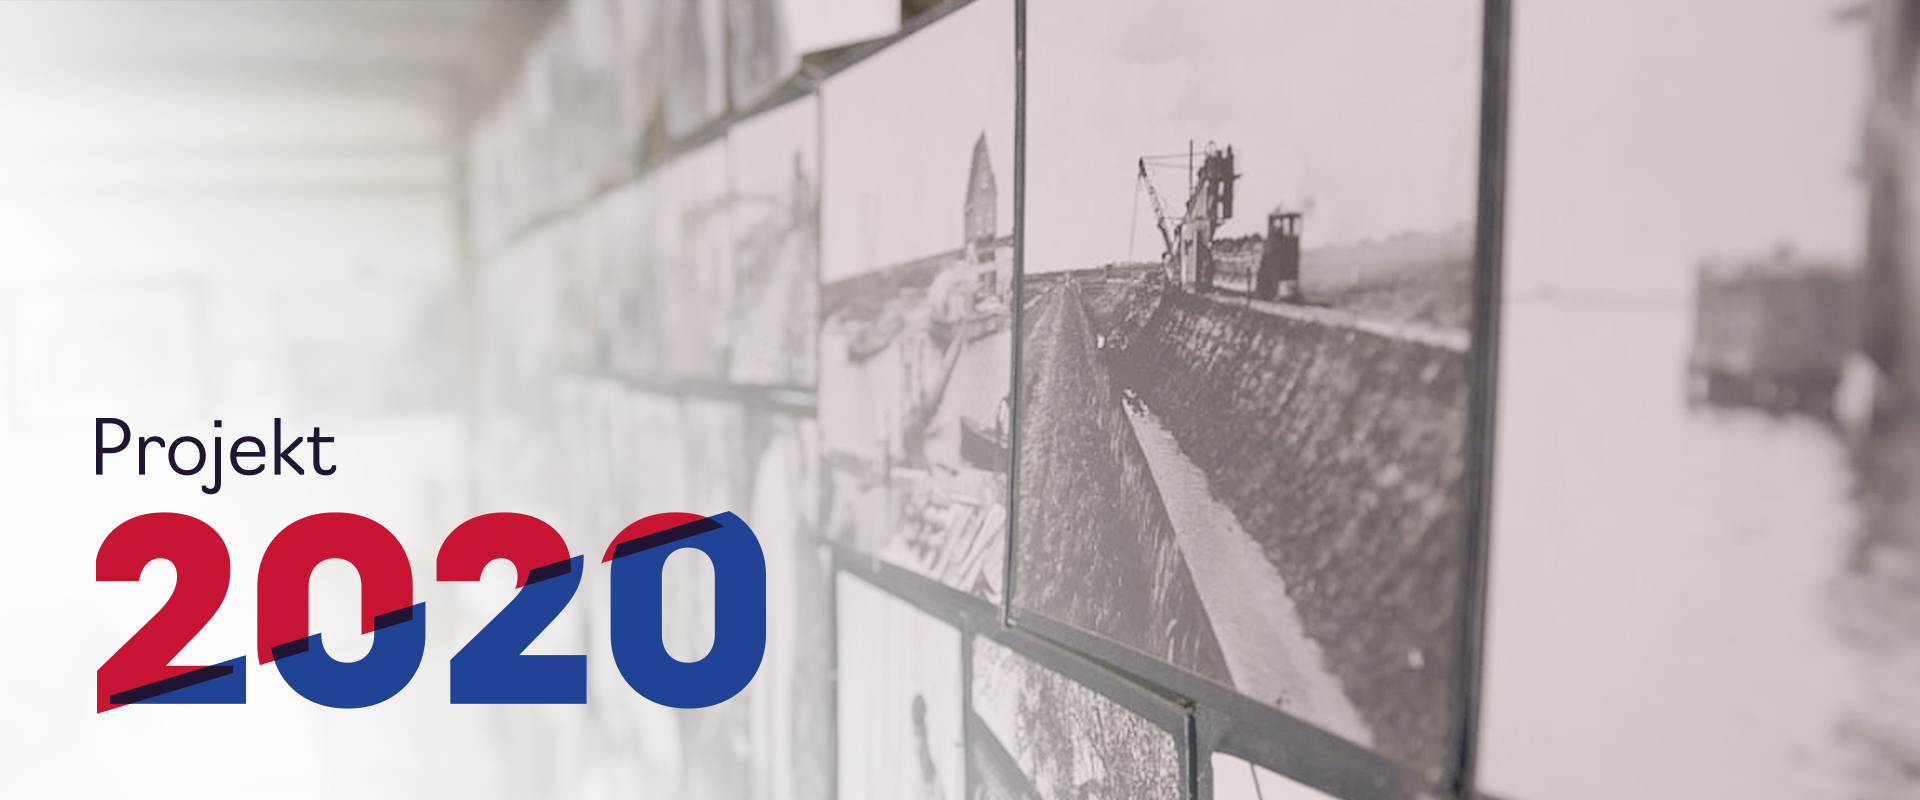 Projekt 2020 - Teil 12 Video